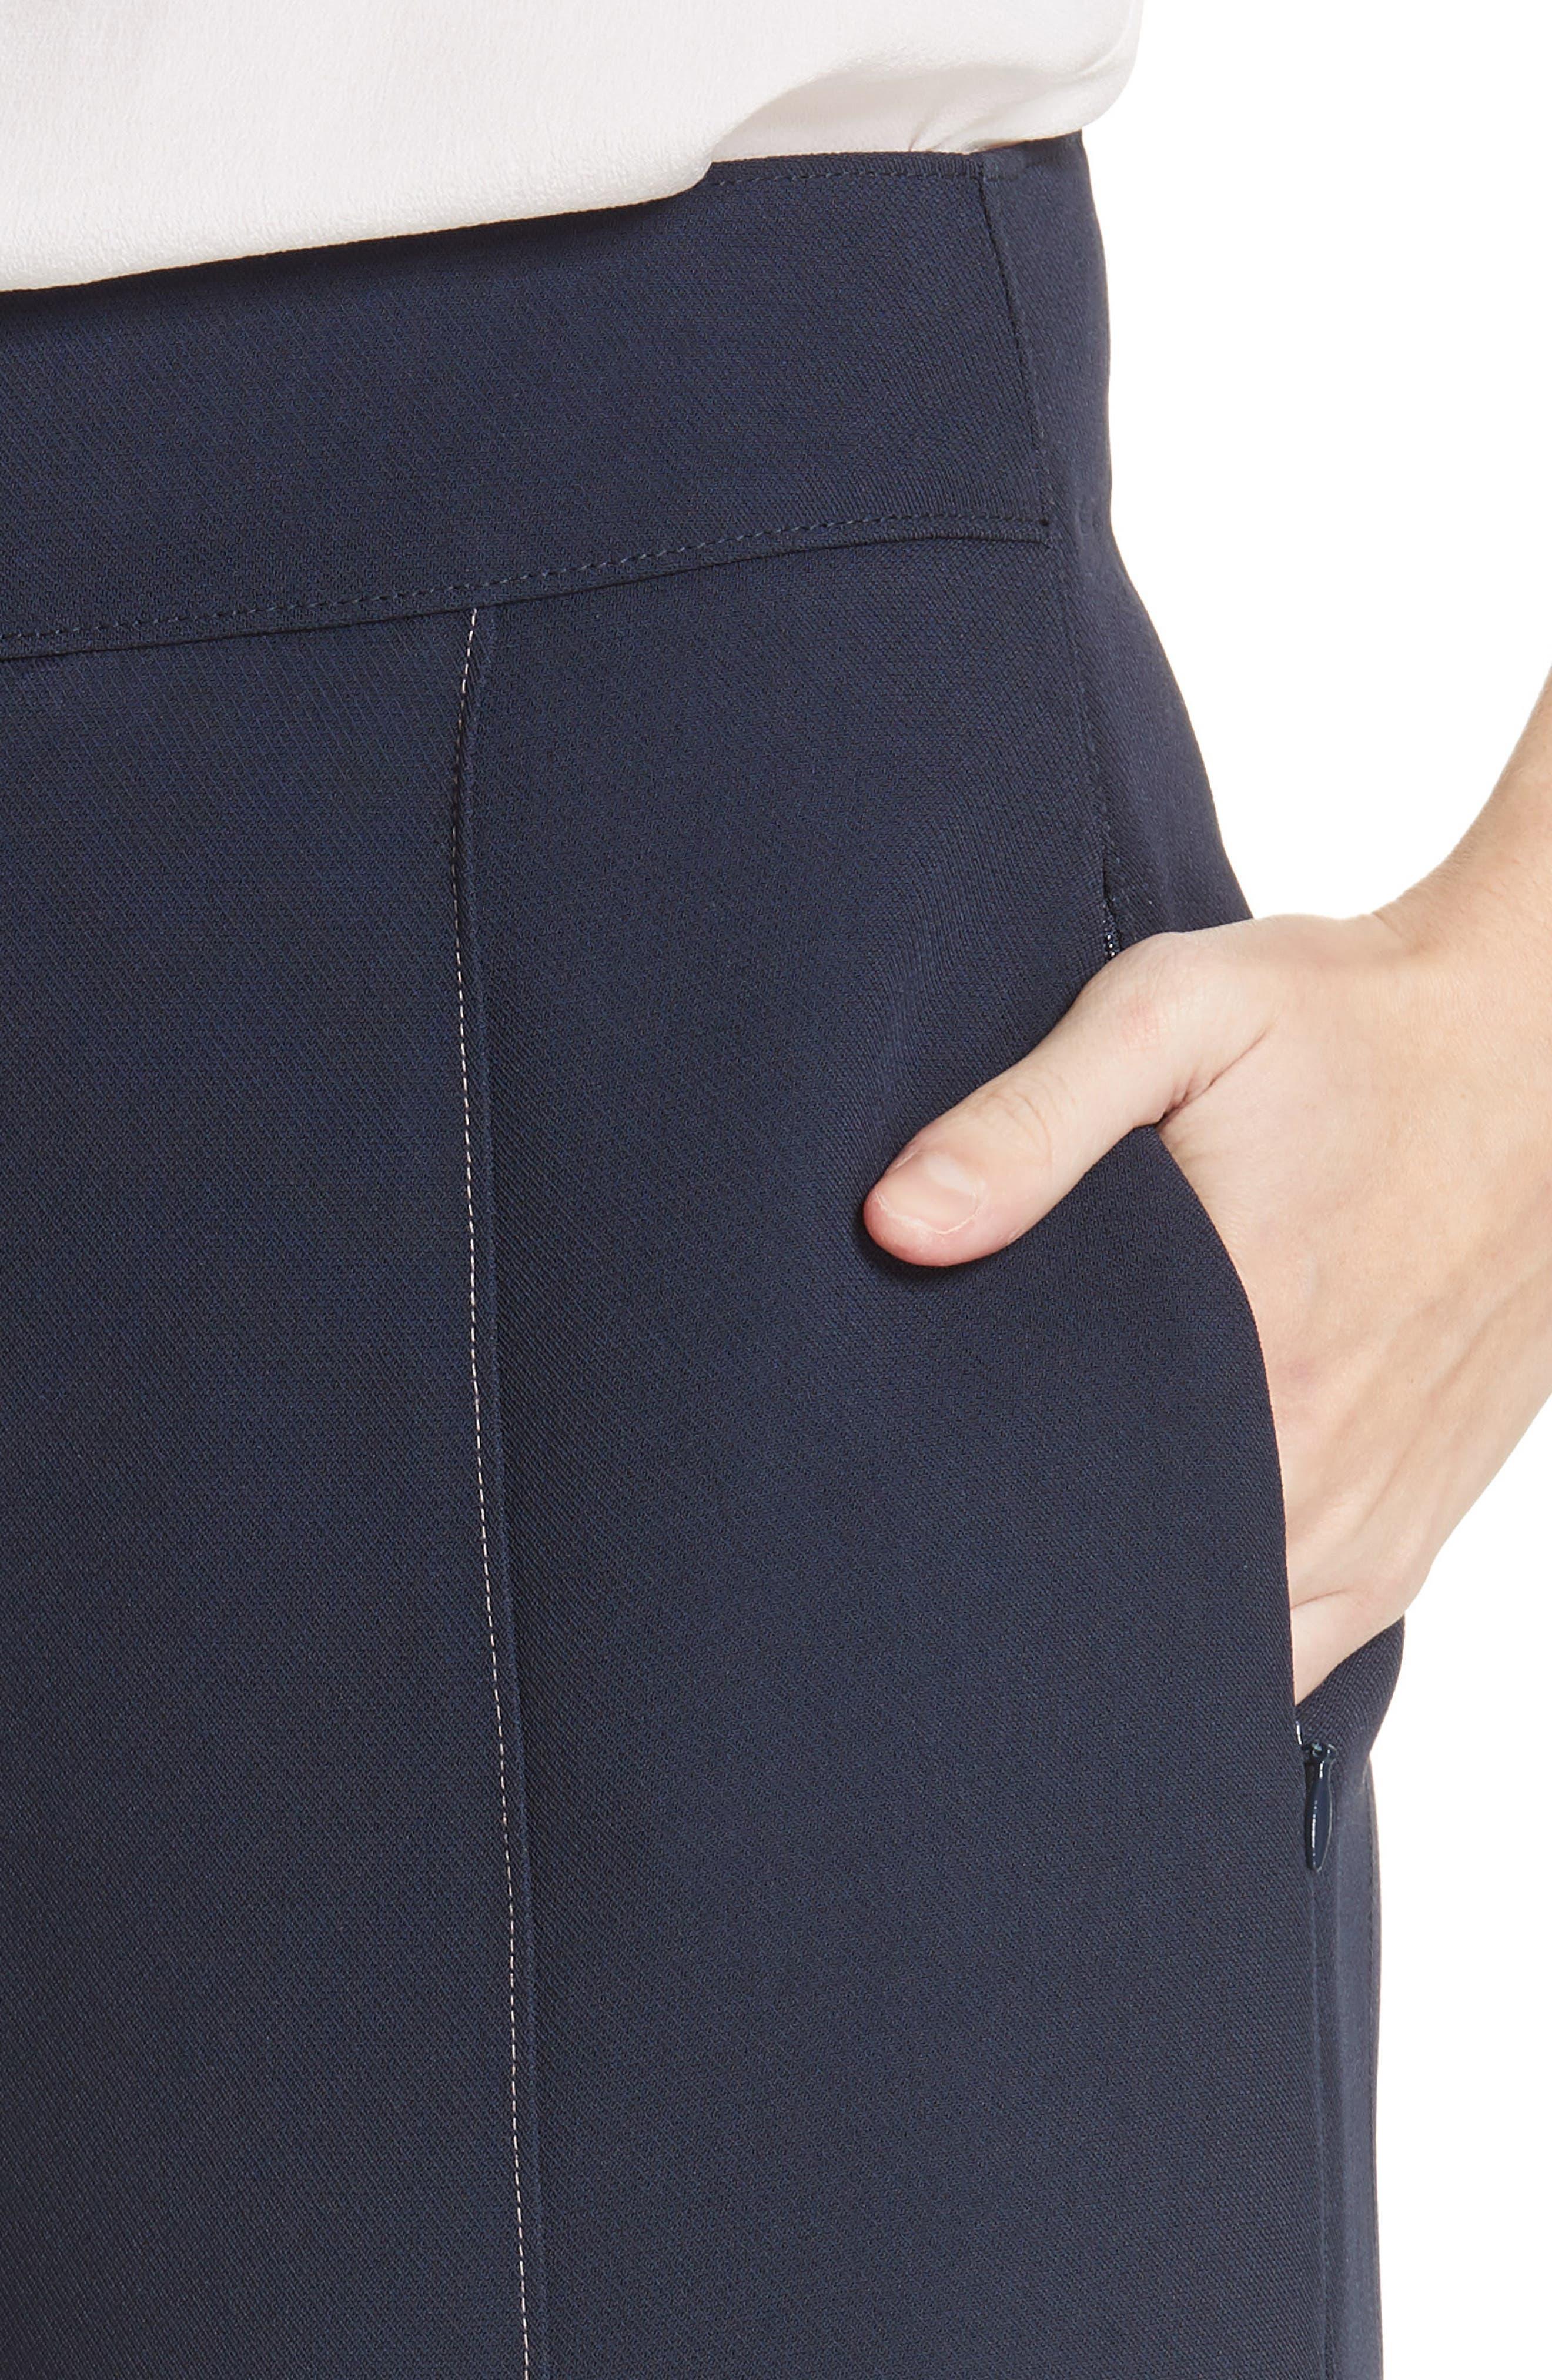 Lapari Pintuck Trousers,                             Alternate thumbnail 4, color,                             Navy